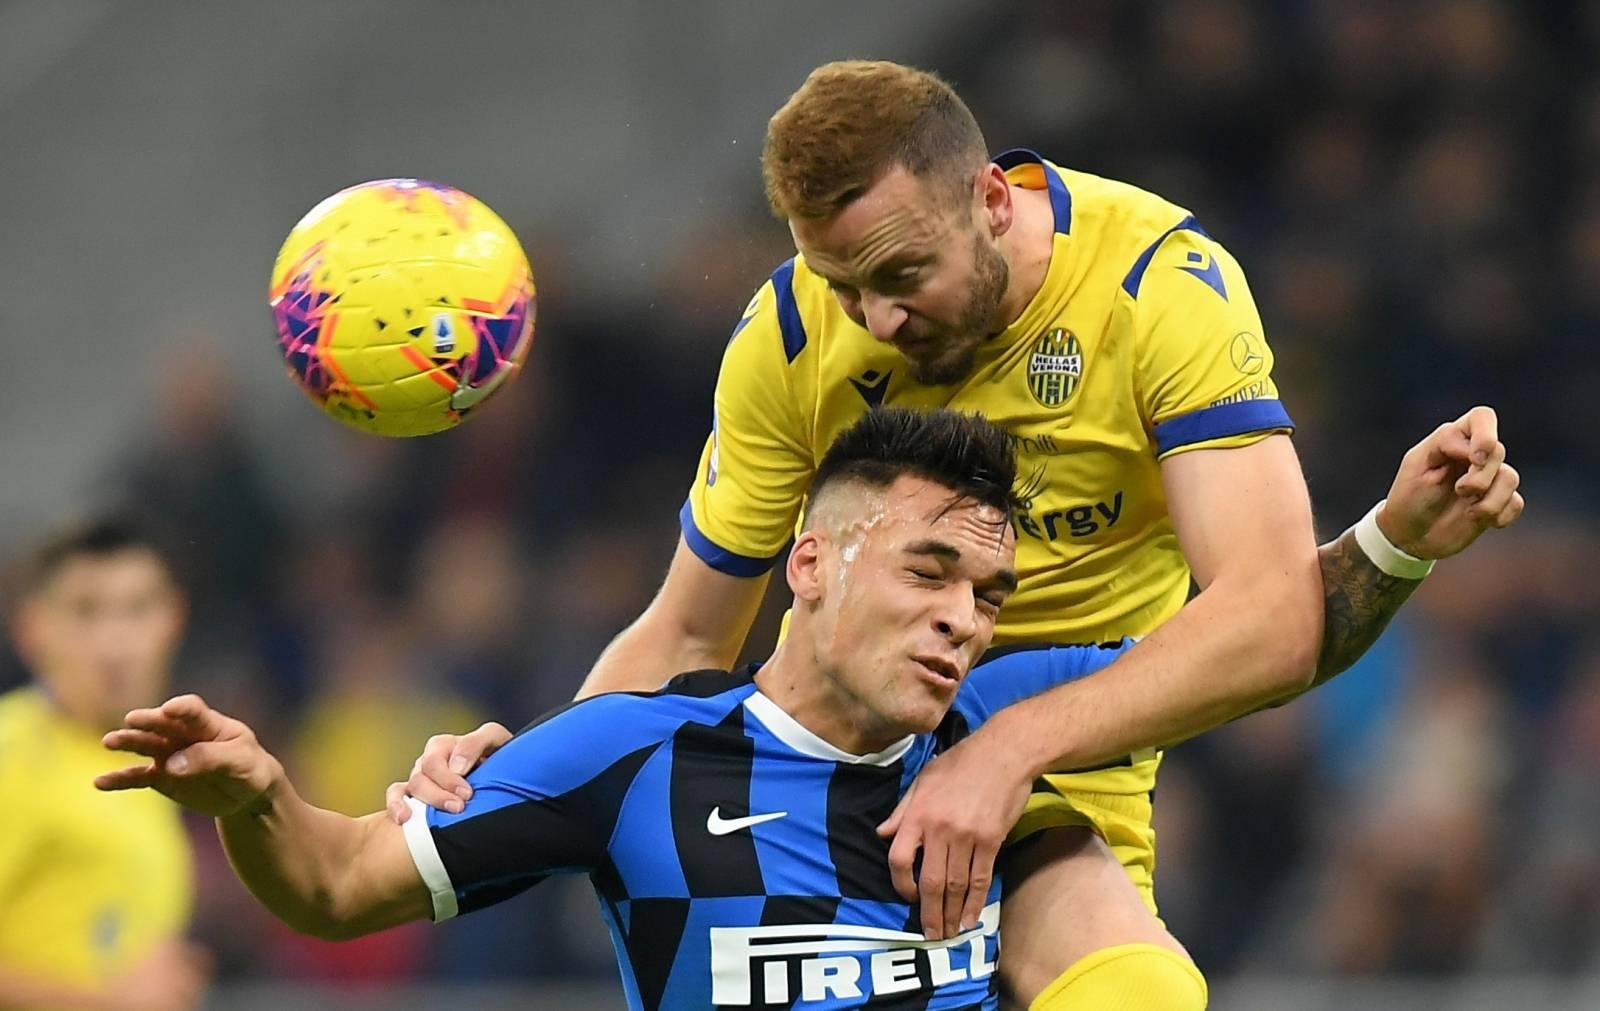 Serie A - Inter Milan v Hellas Verona